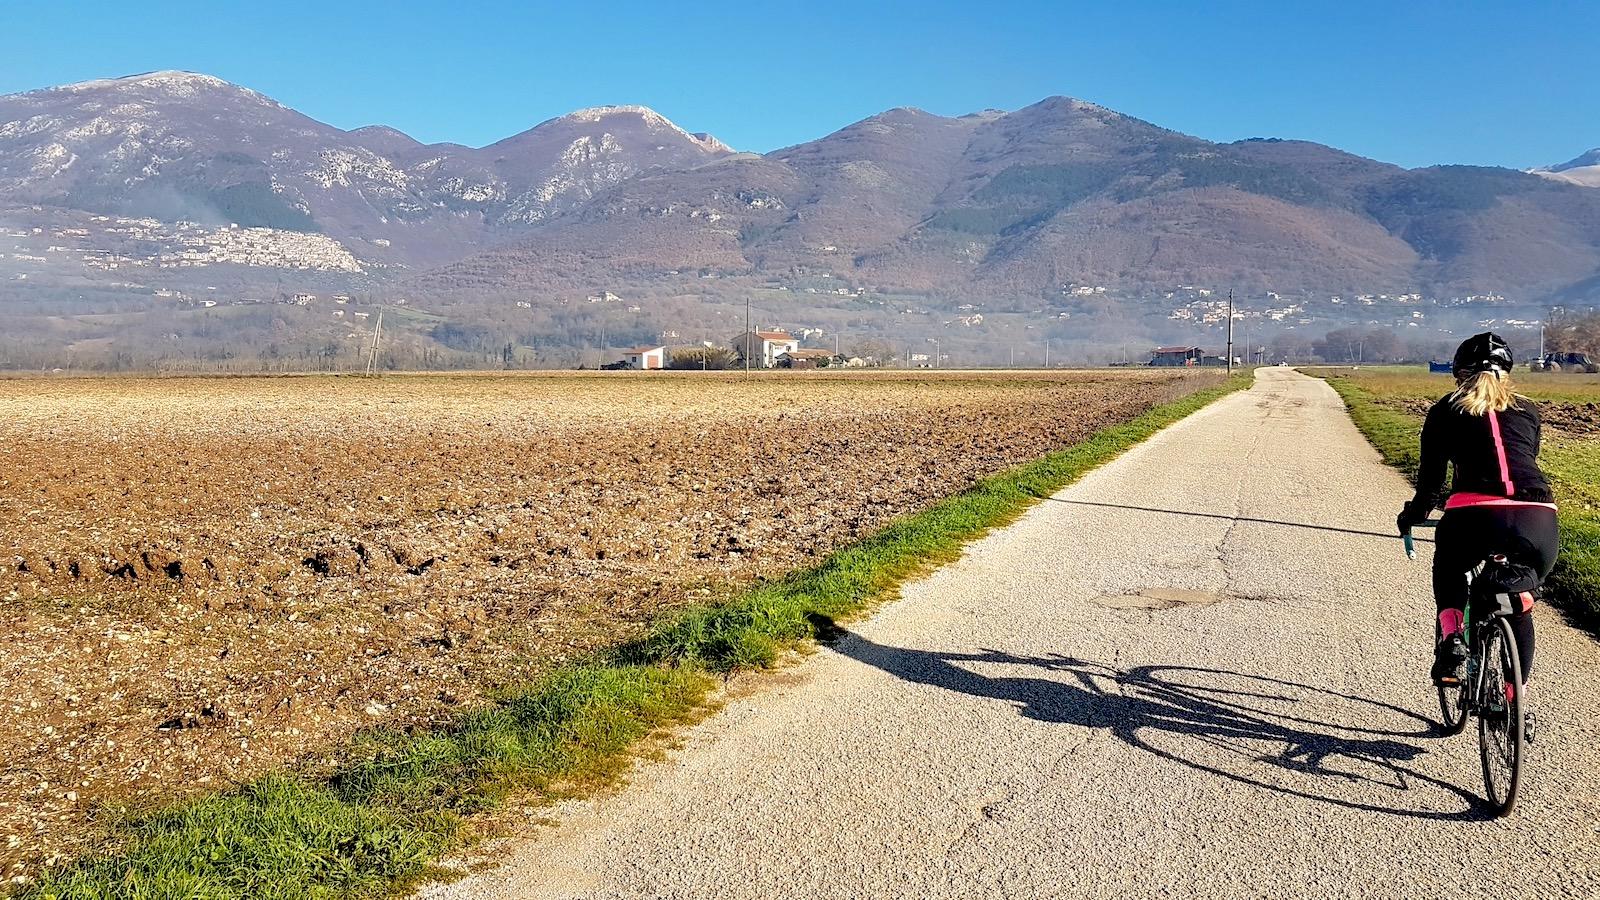 Valle reatina Poggio Bustone1